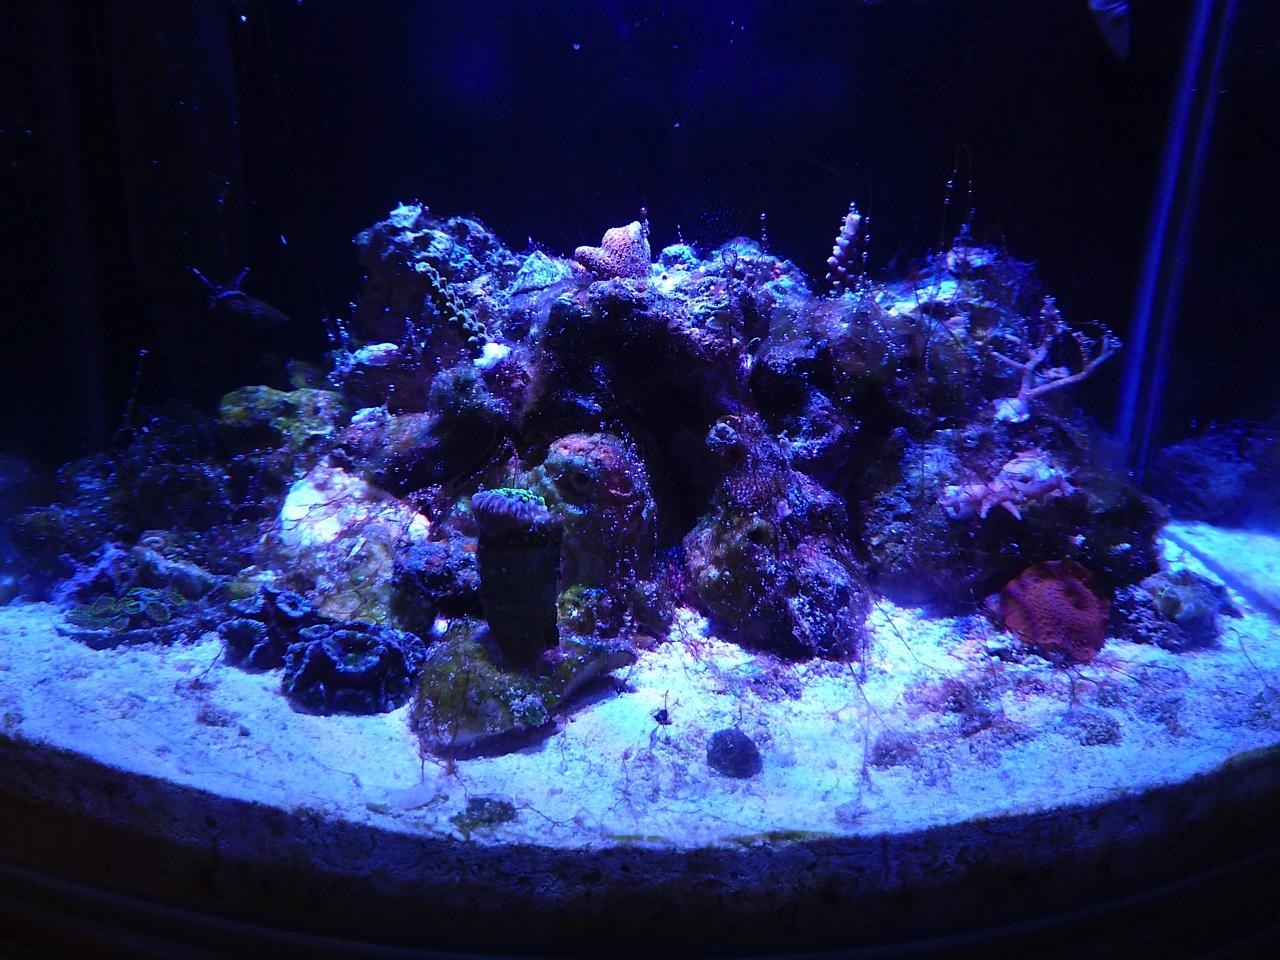 how to get rid of cyanobacteria